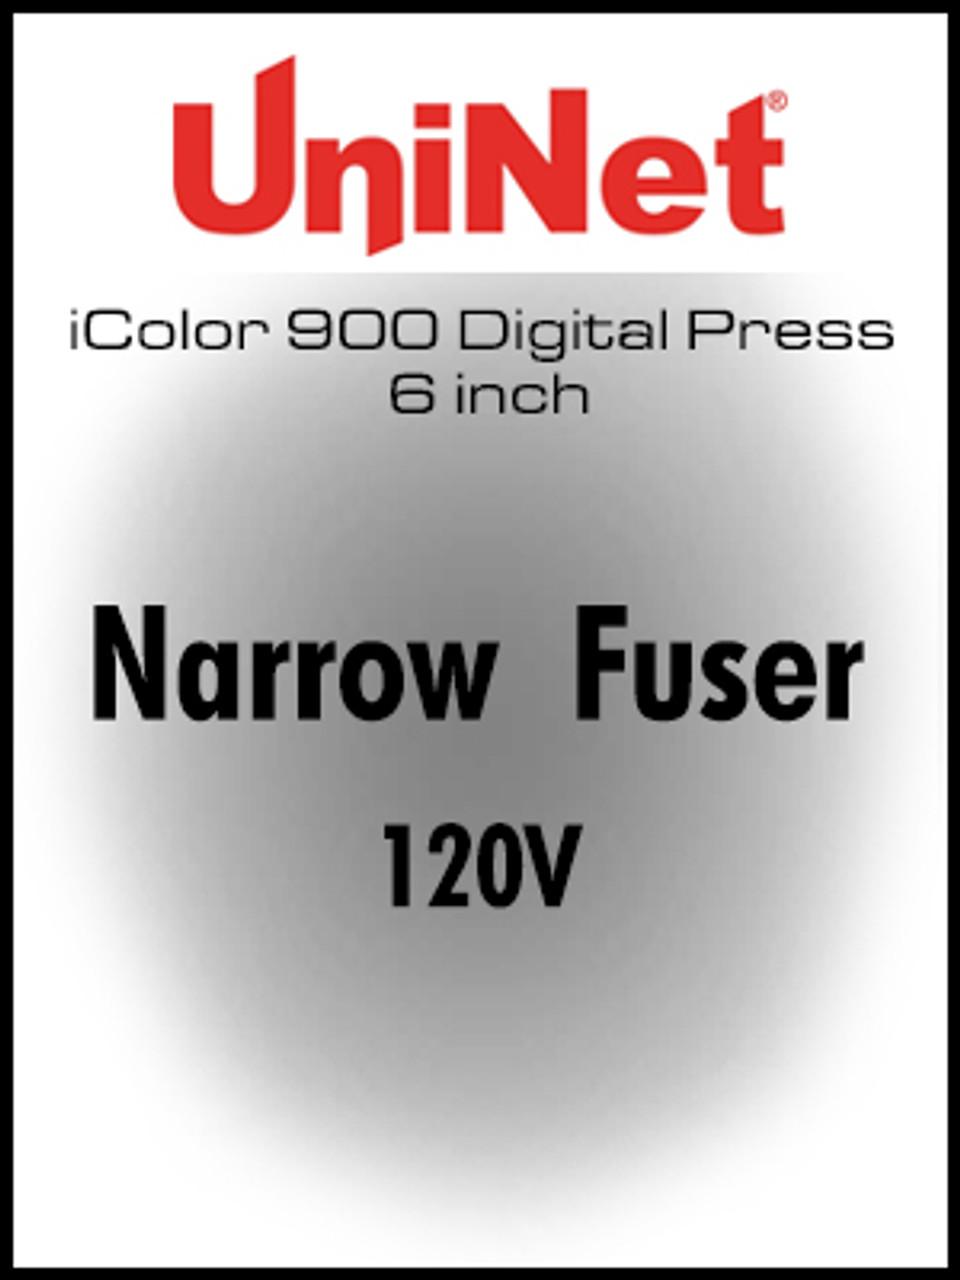 iColor 900 Digital Press 6 inch Narrow Fuser 120V